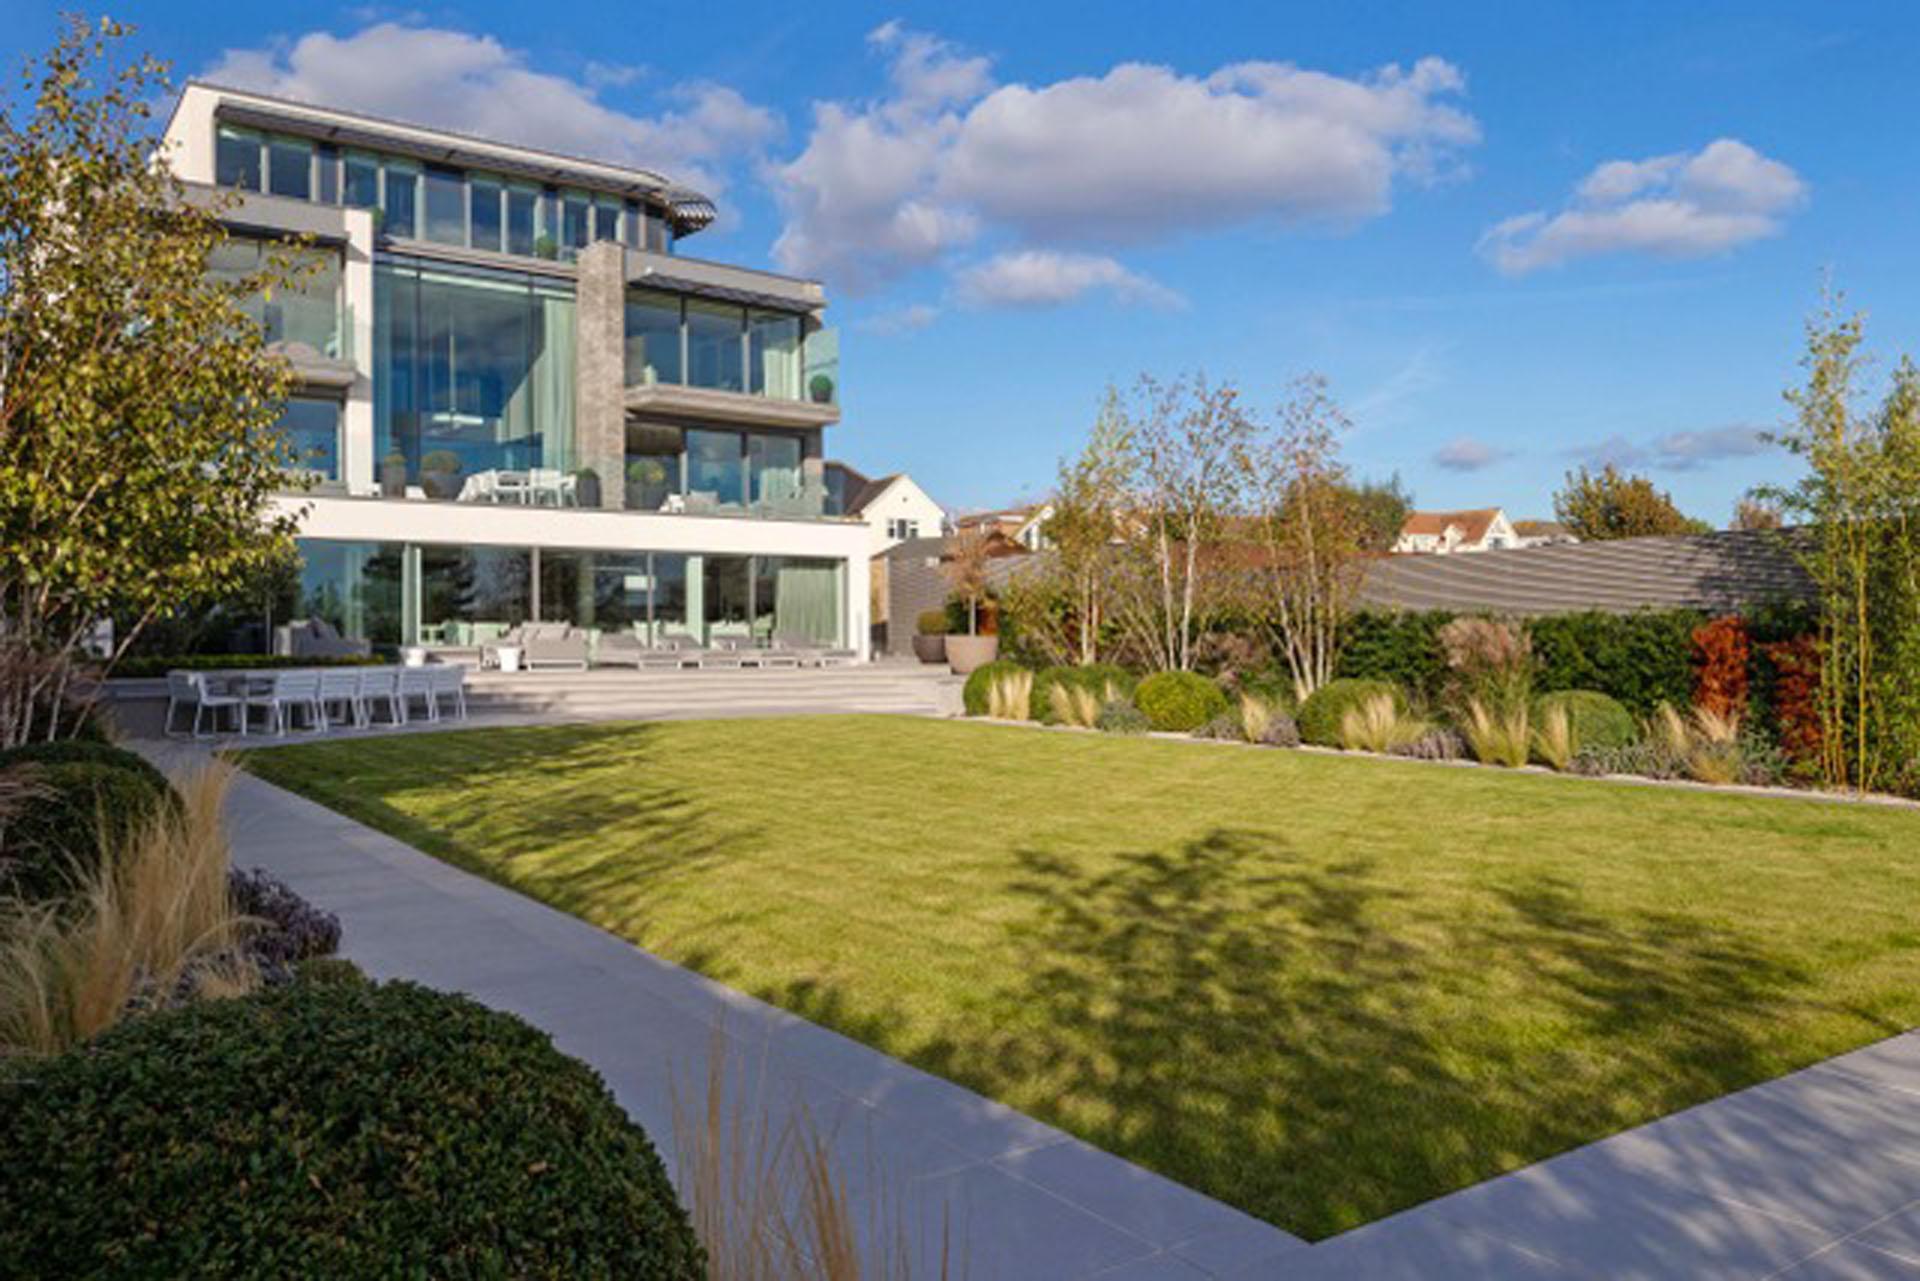 Rear Garden with central lawn, Essex